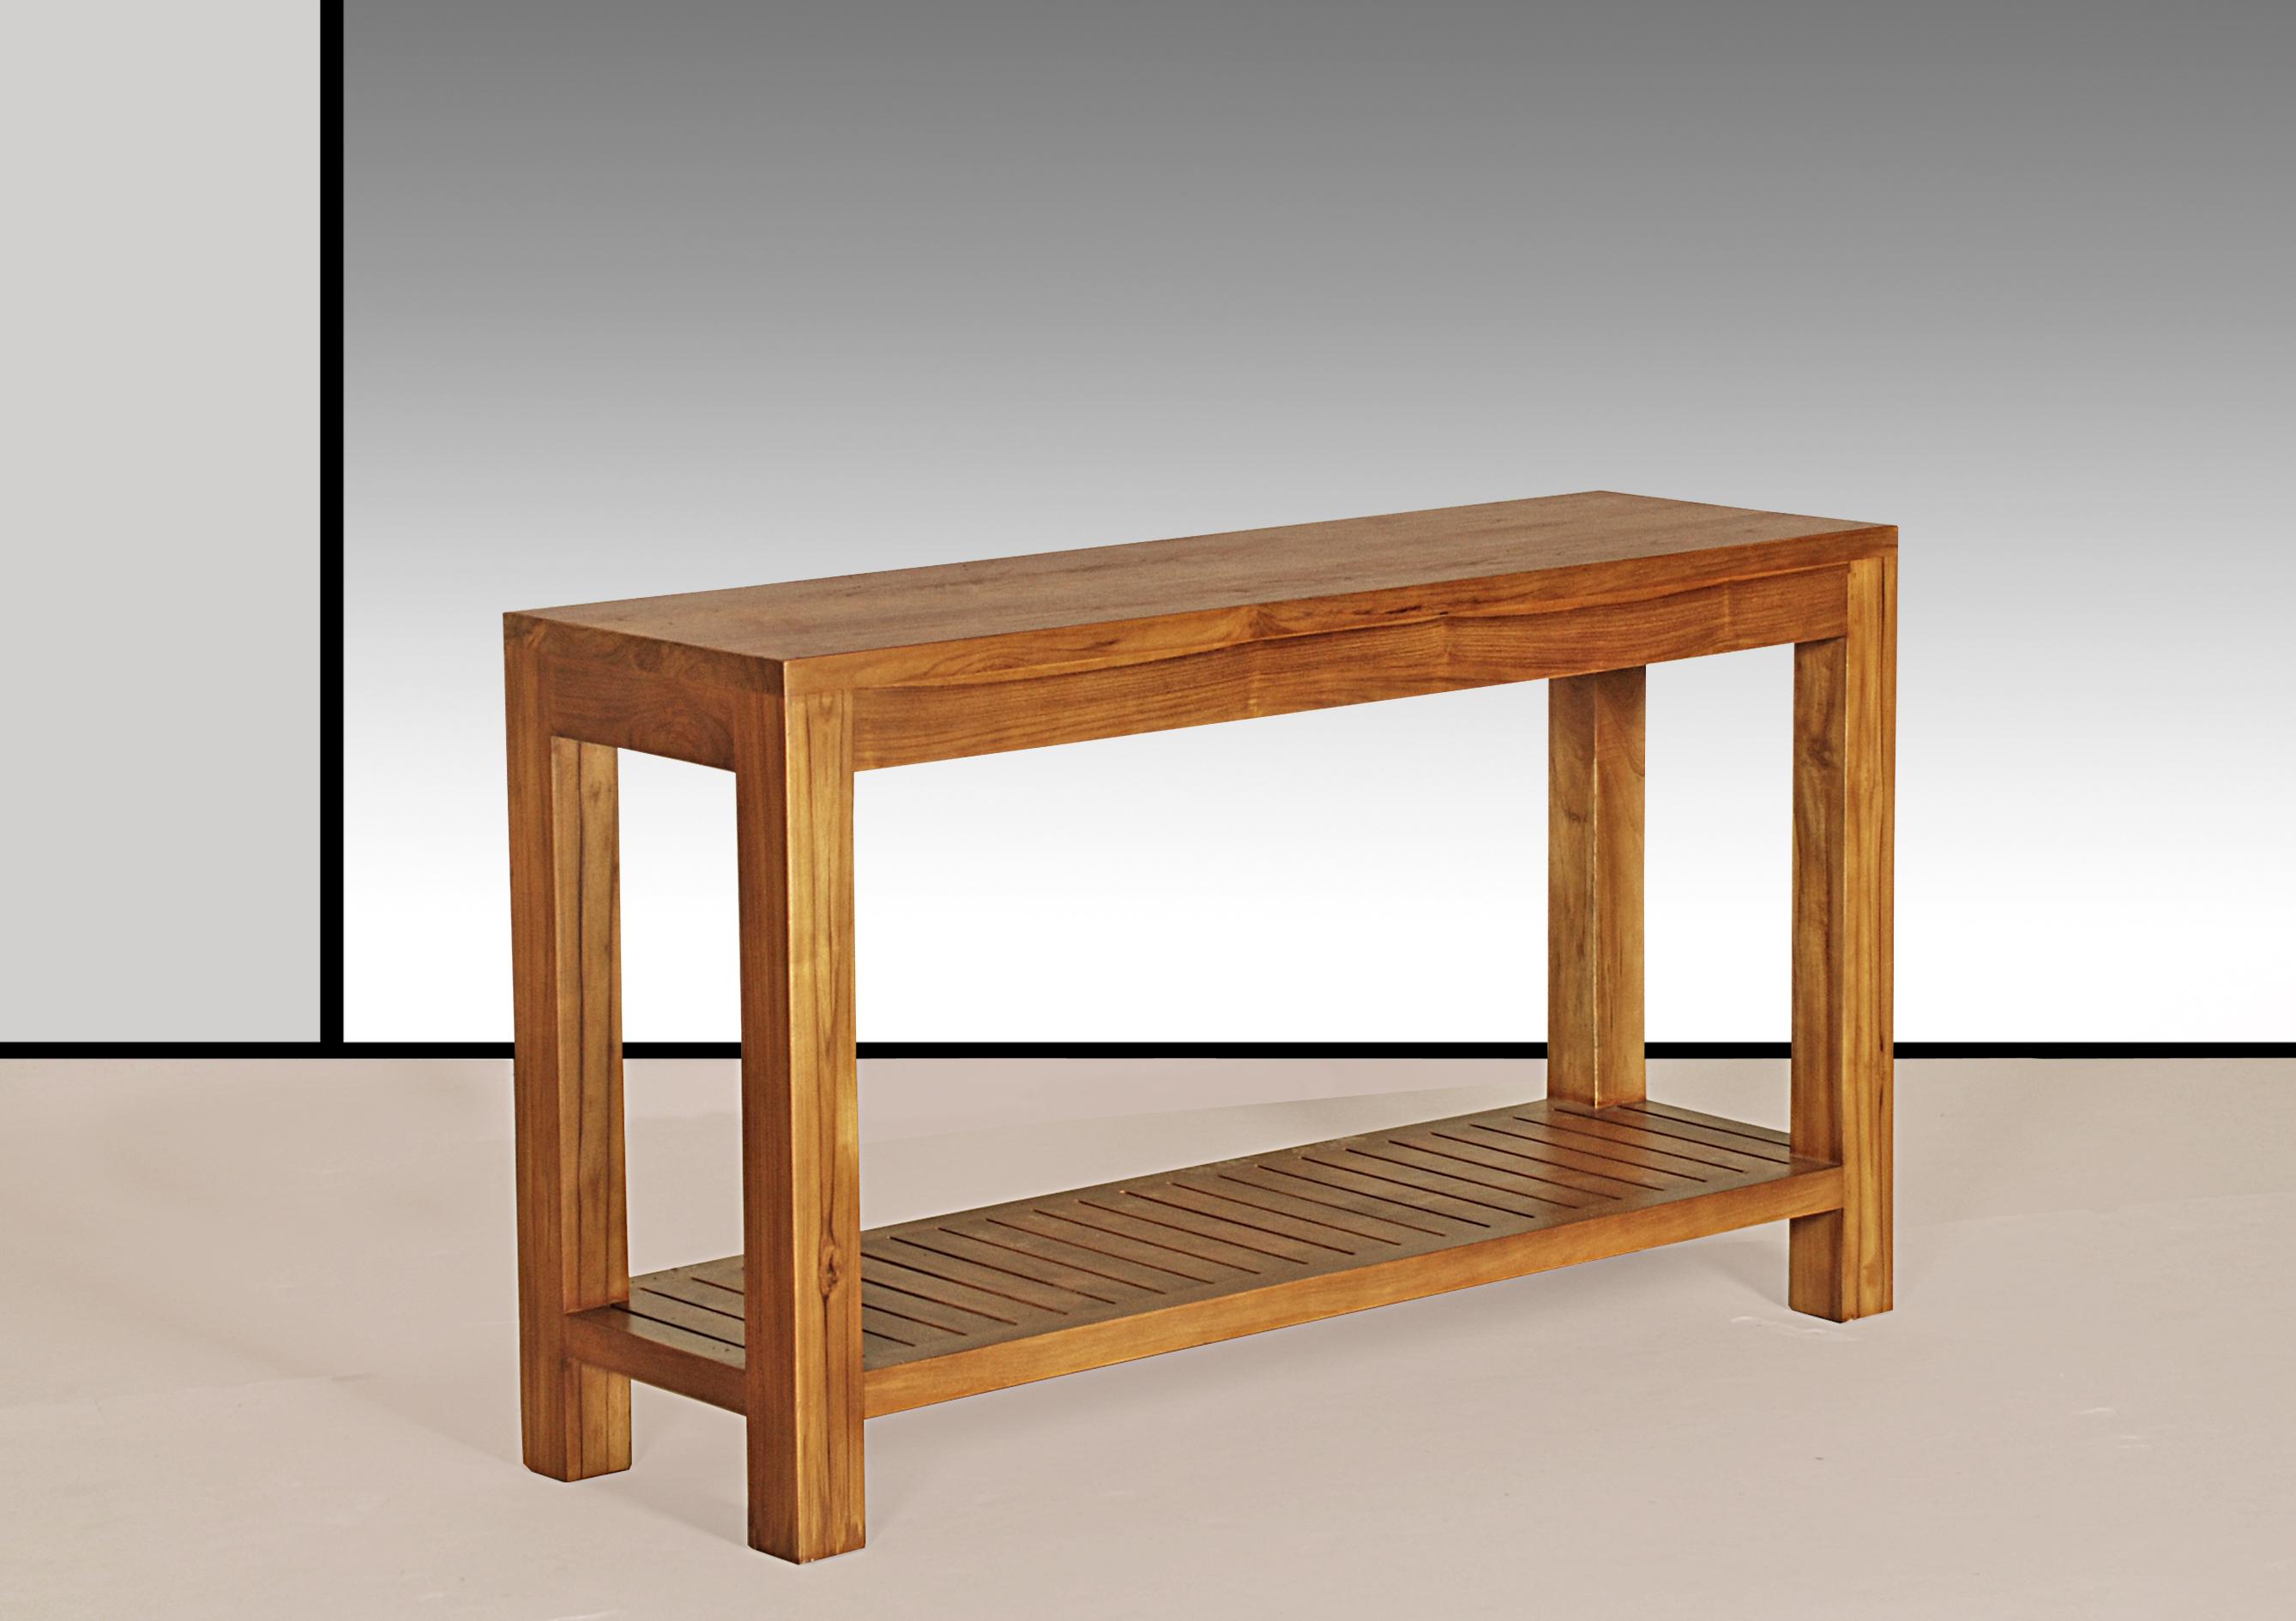 ... Teak Wood Console Table| Teak Console Table ...